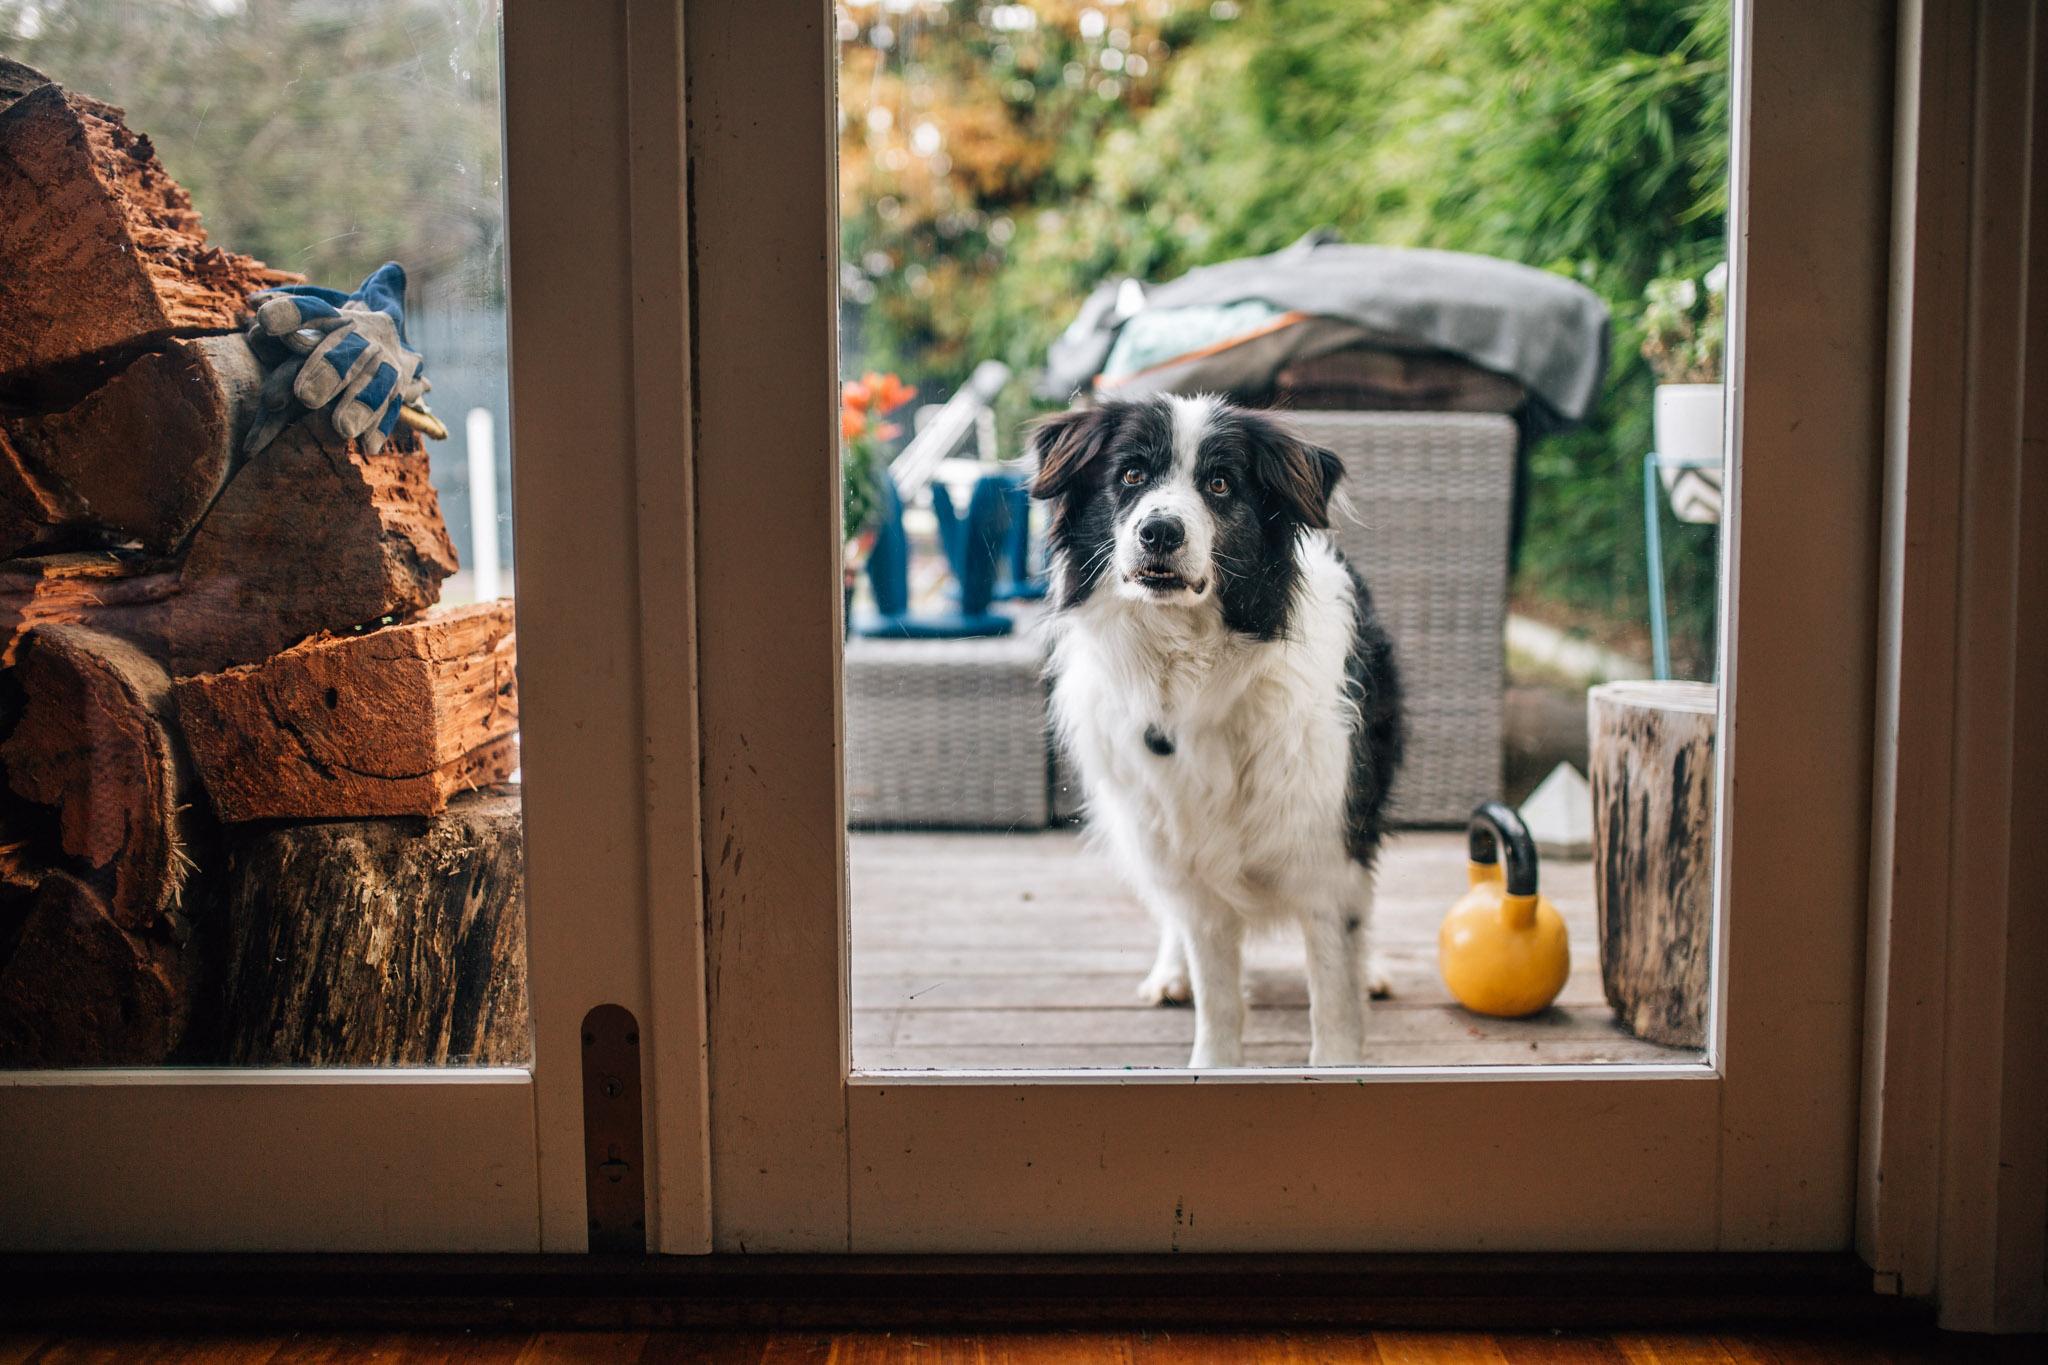 Dog outside glass door.